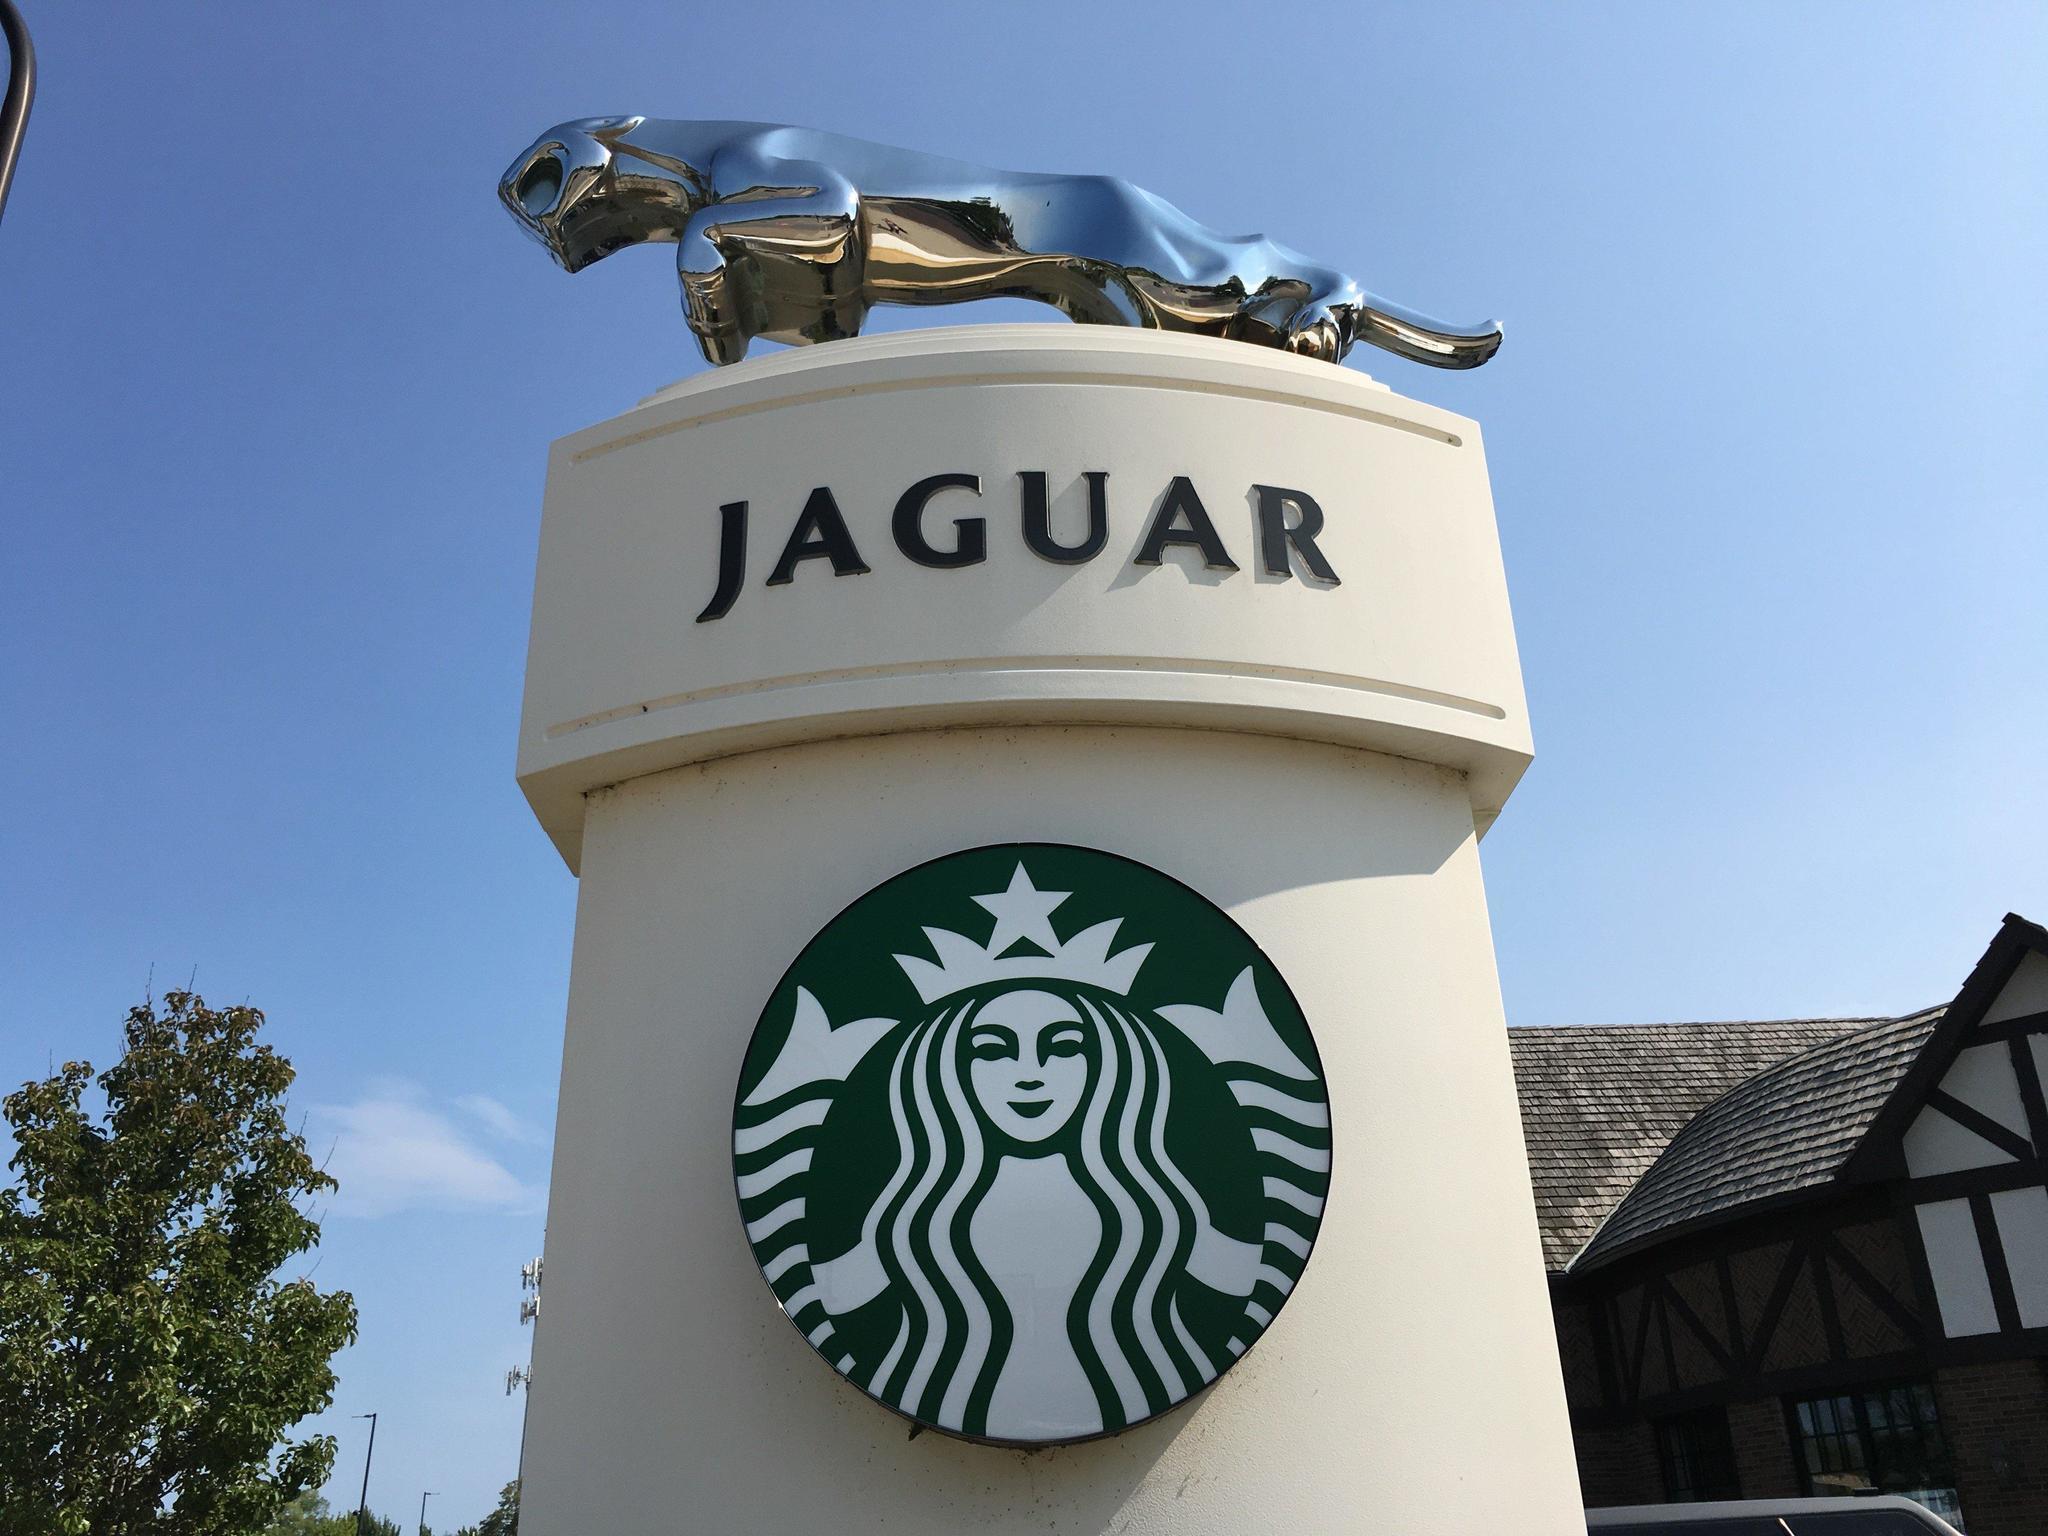 imperial motors jaguar dealership closes wilmette location wilmette life. Black Bedroom Furniture Sets. Home Design Ideas